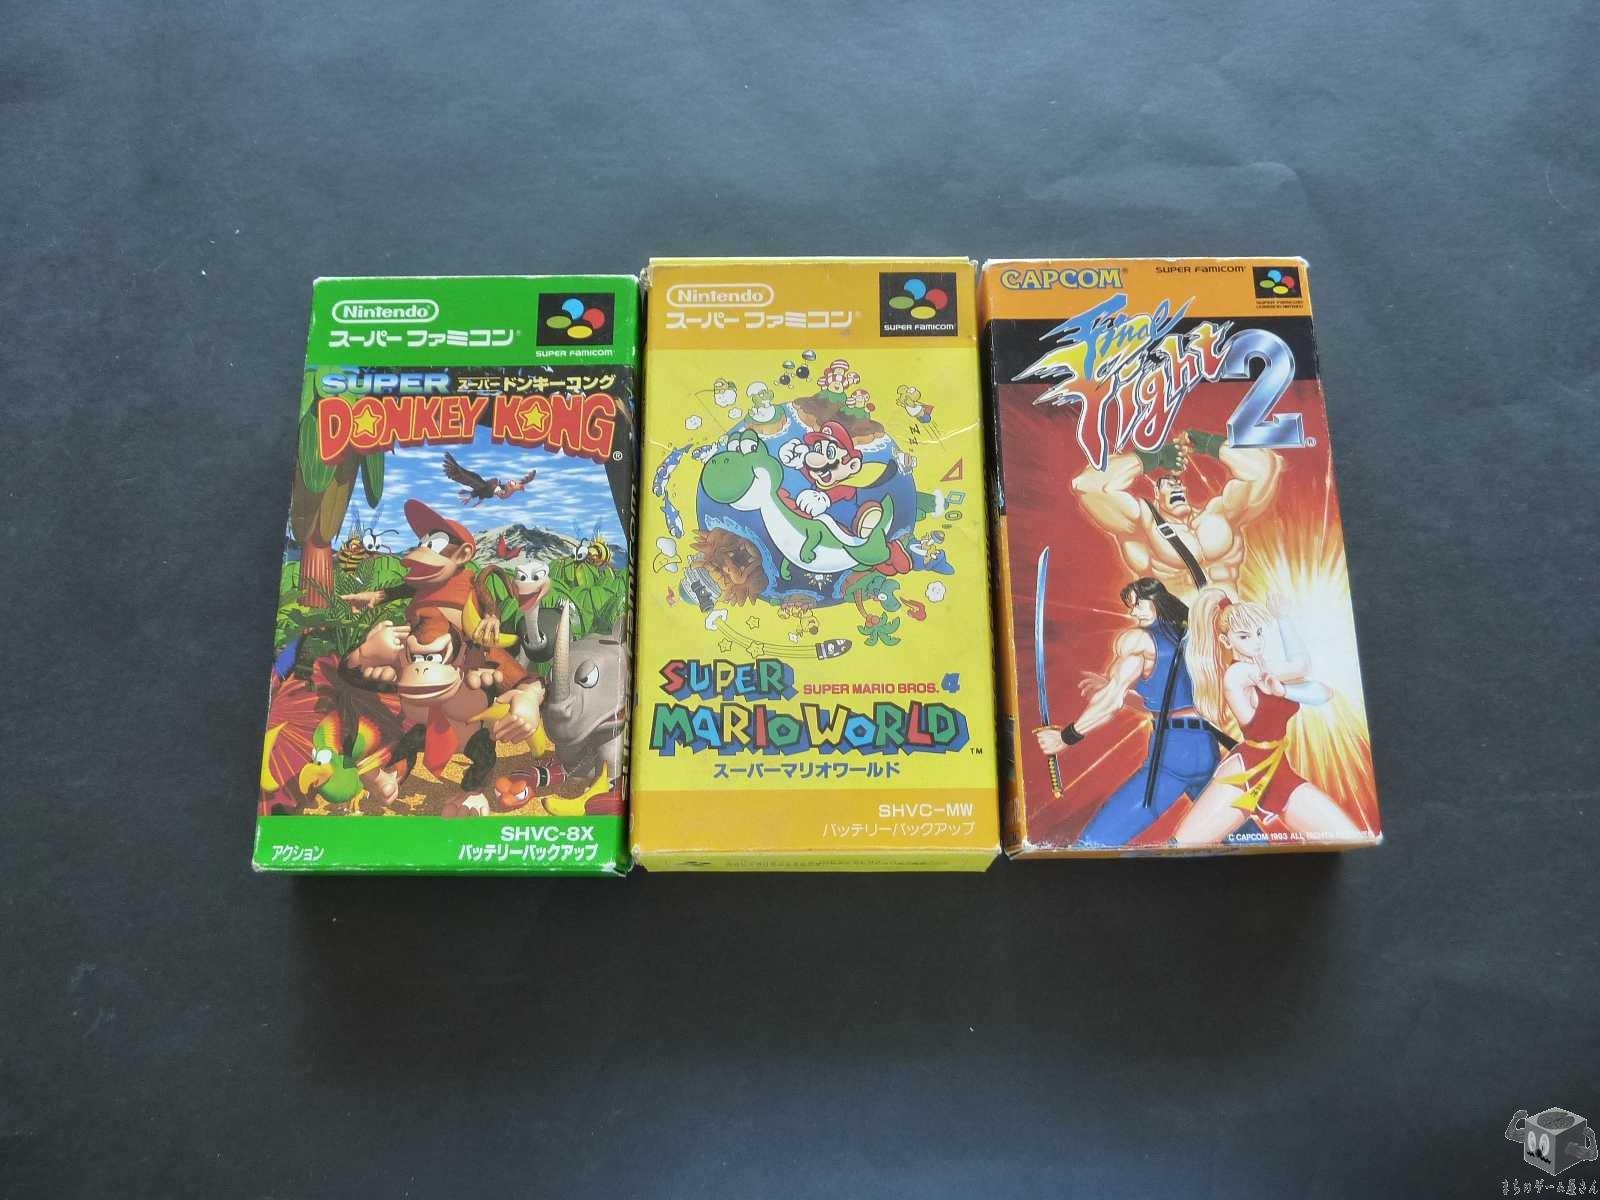 [SFC] Final Fight 2,Super Donkey Kong,Super Mario Bros set of 3 games